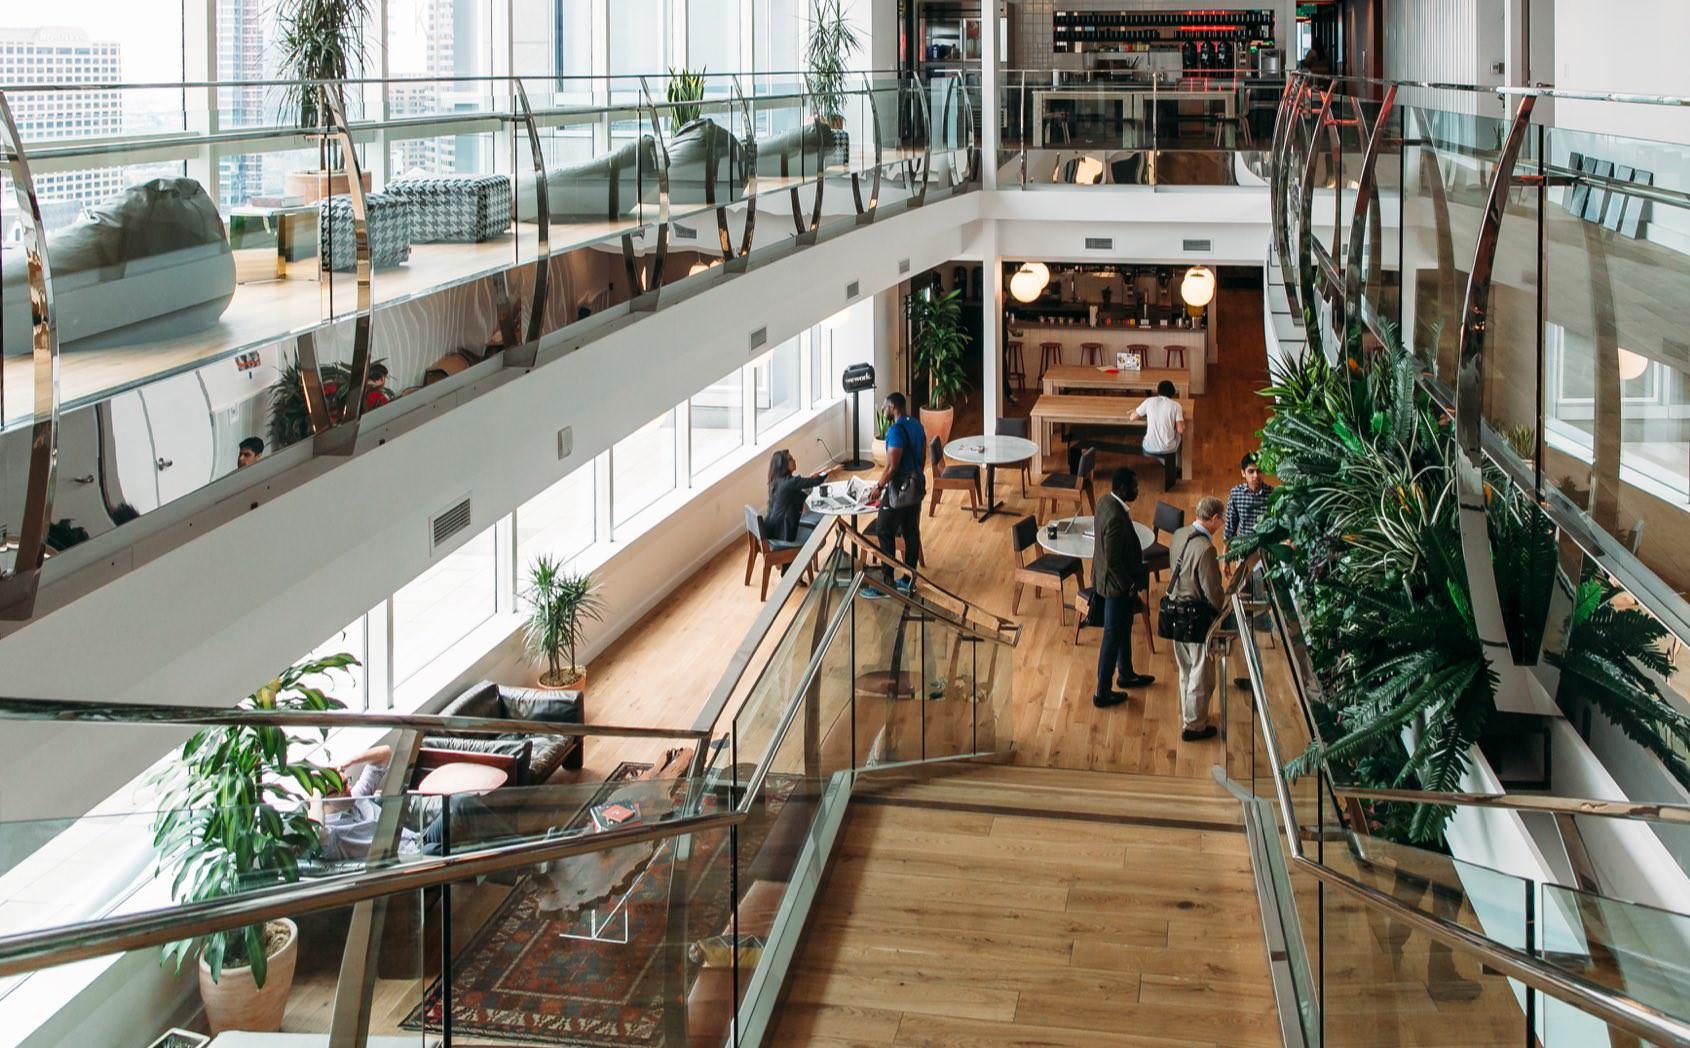 WeWork Los Angeles multi-story office space